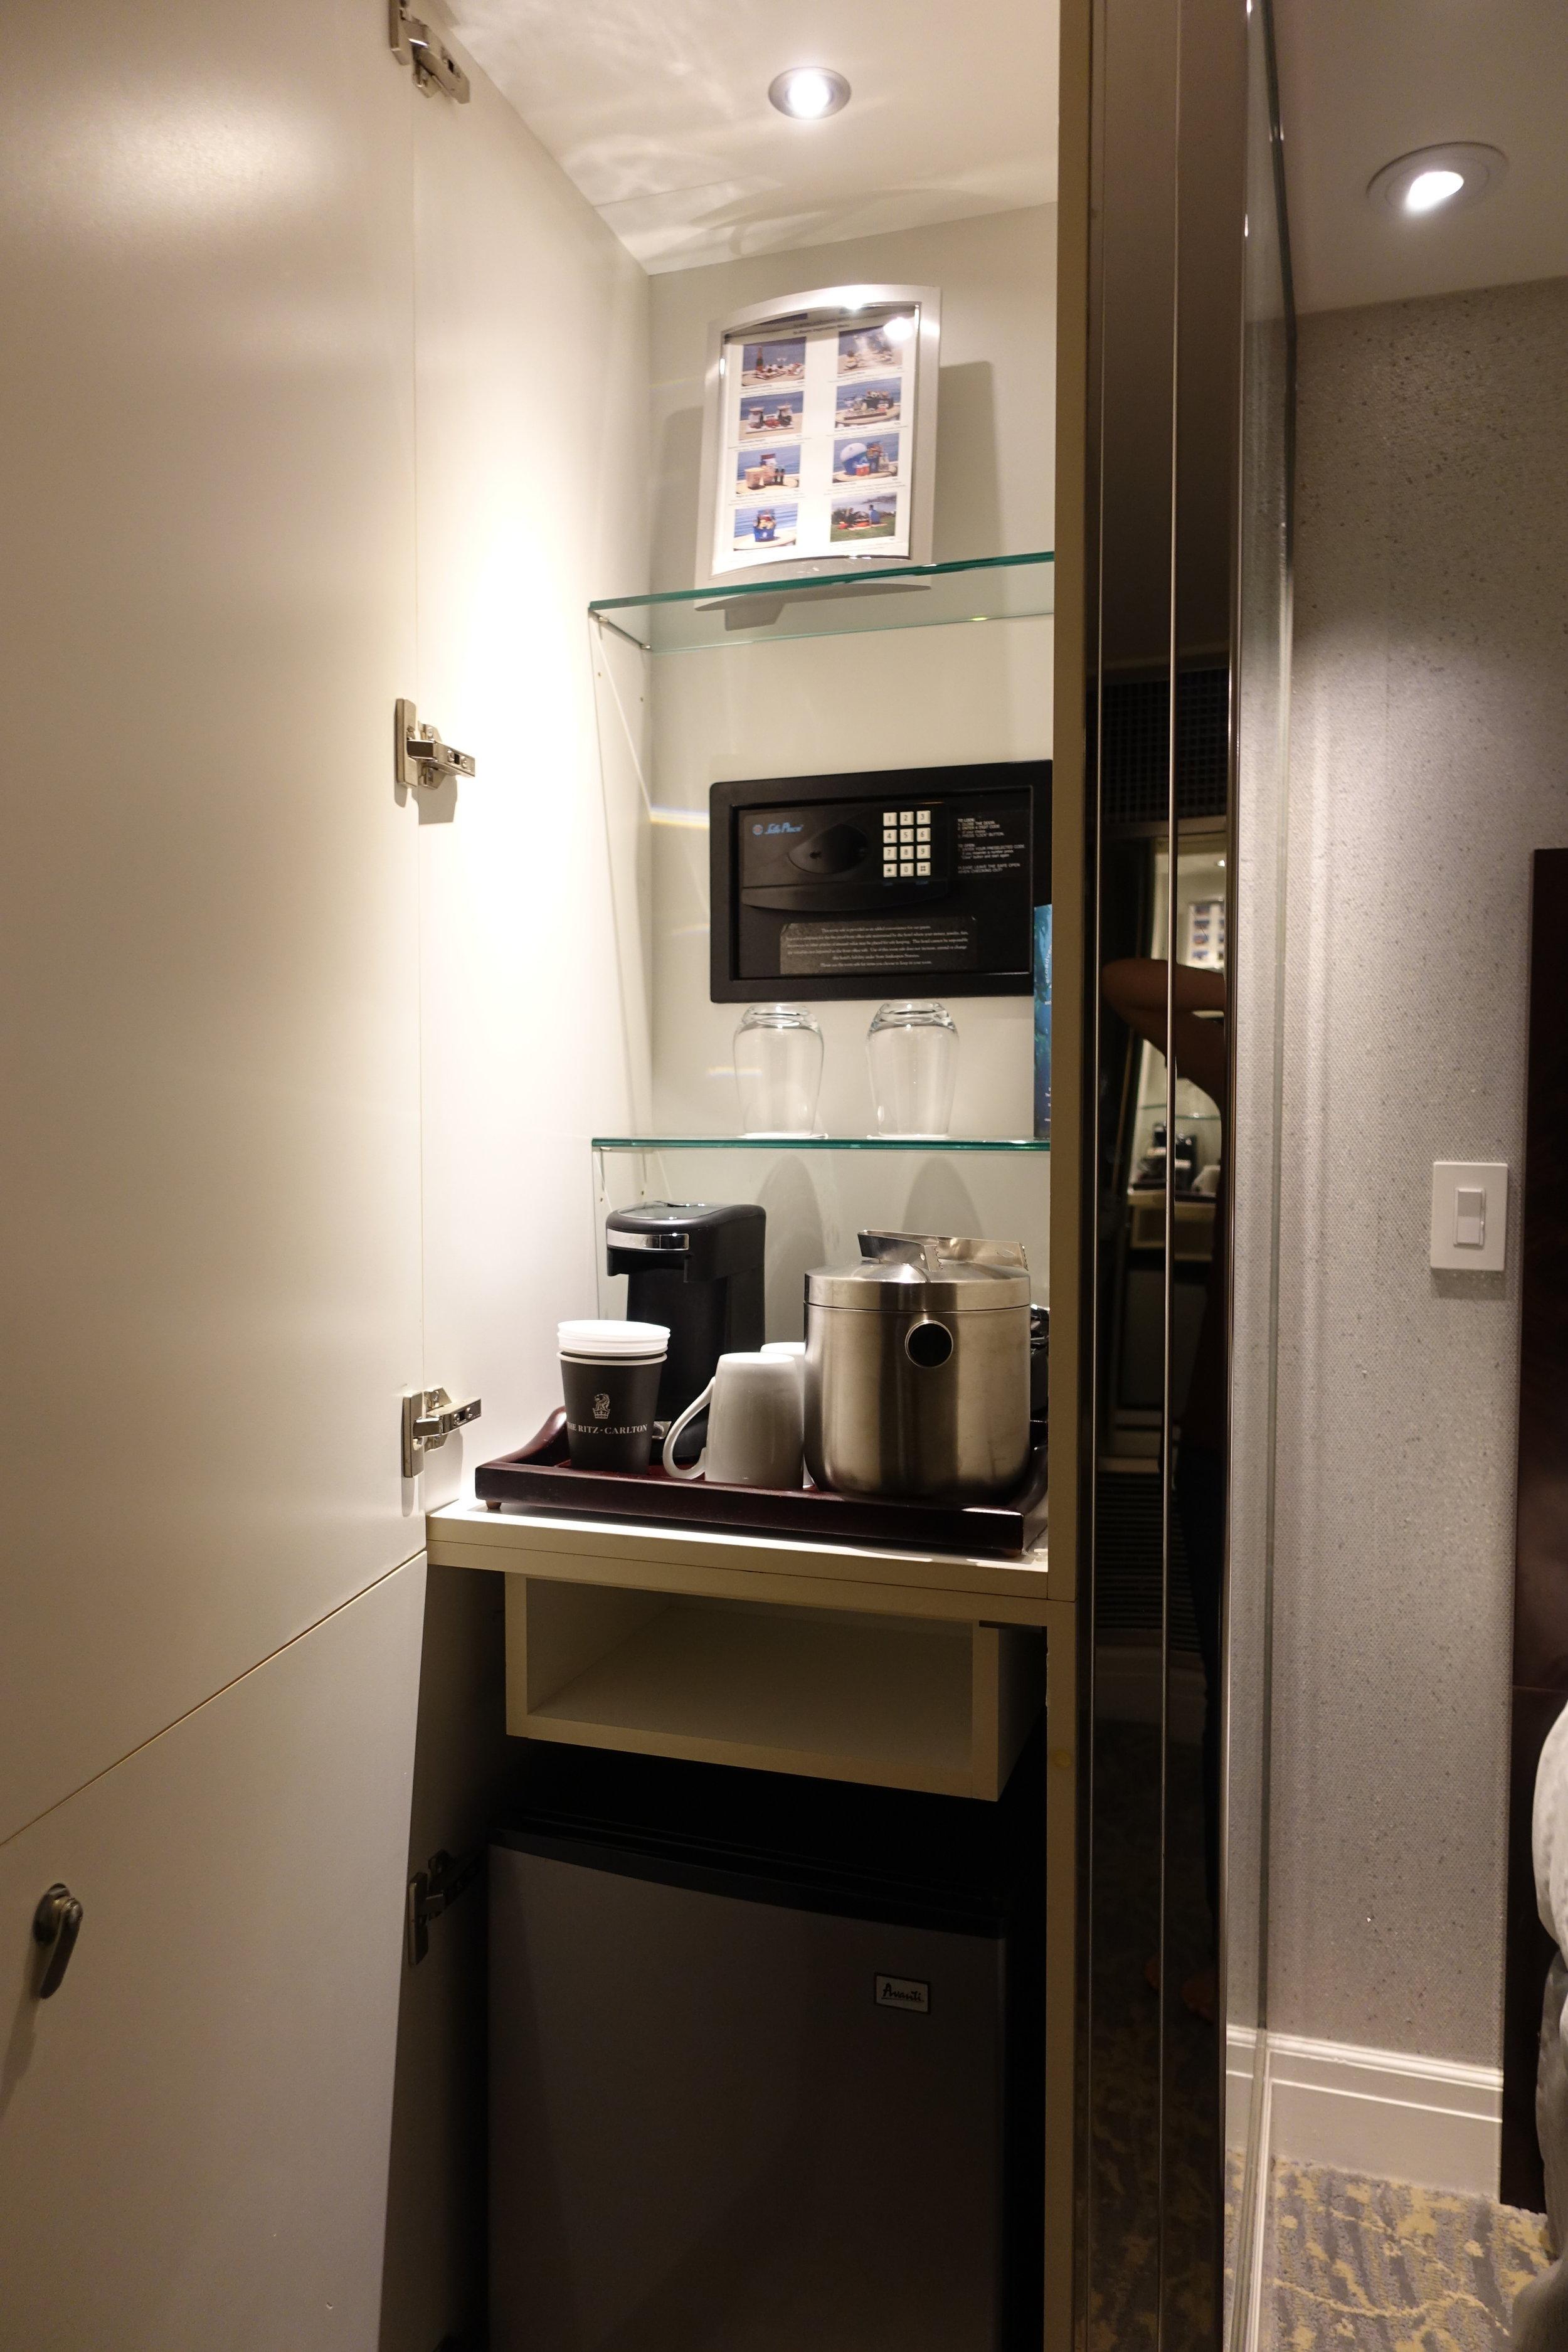 coffee and minifridge